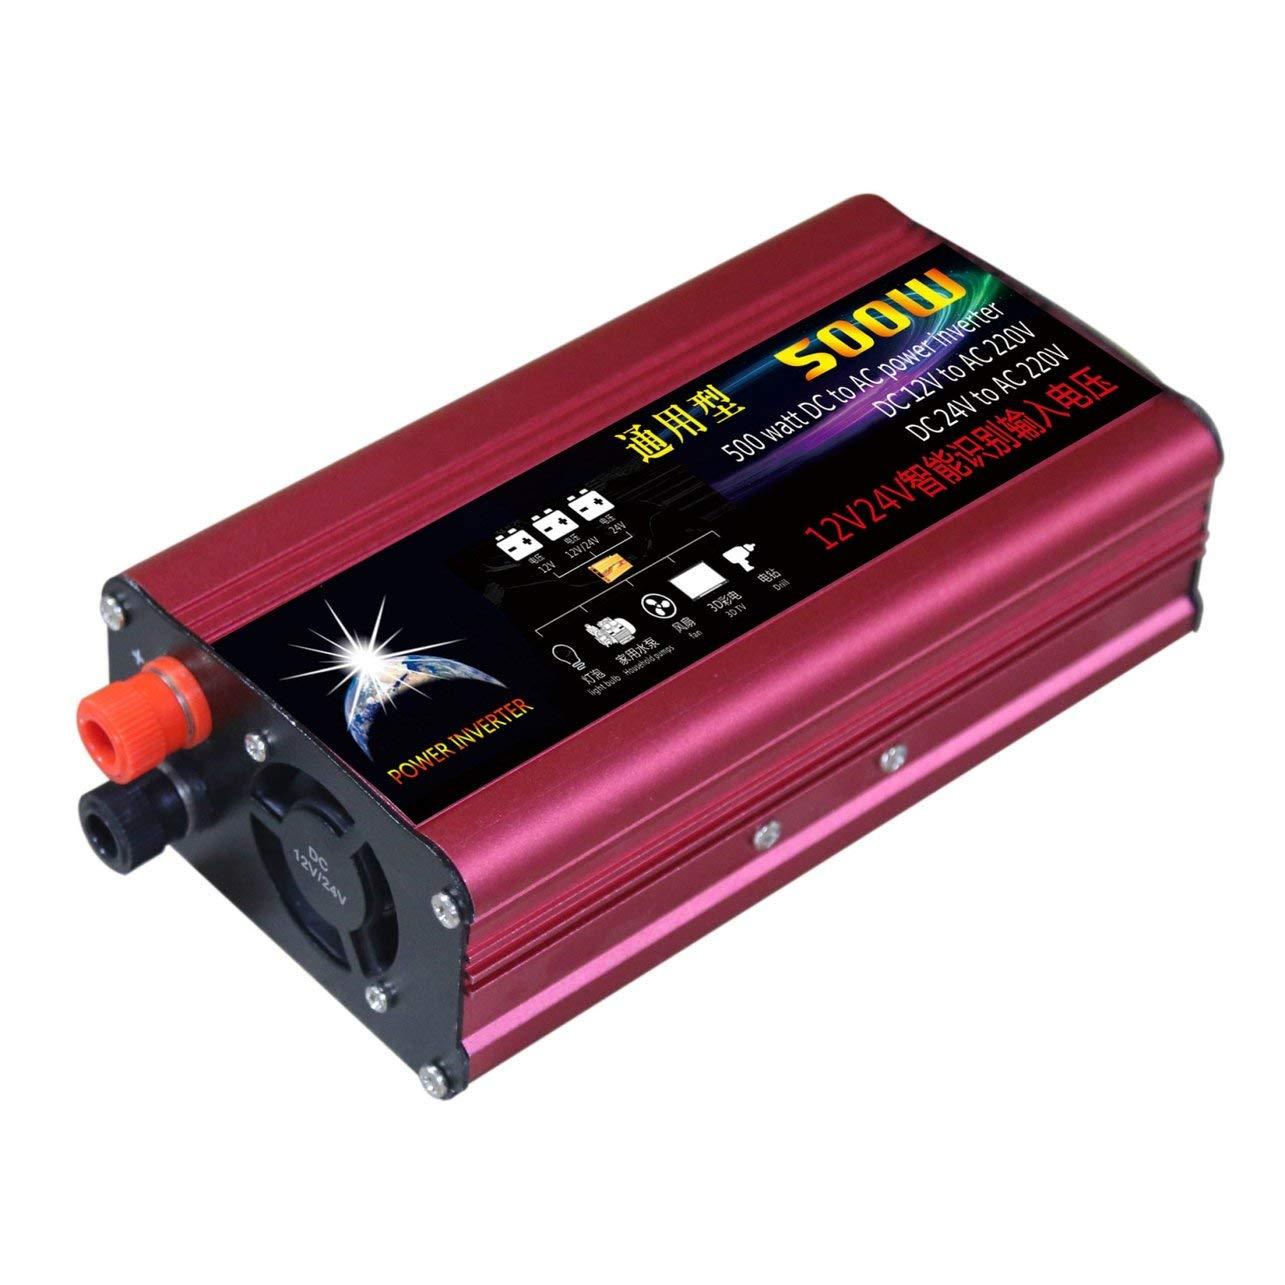 WOSOSYEYO 1000W Power Inverter 12V / 24V à 220V Automobile onduleur Alimentation Voiture